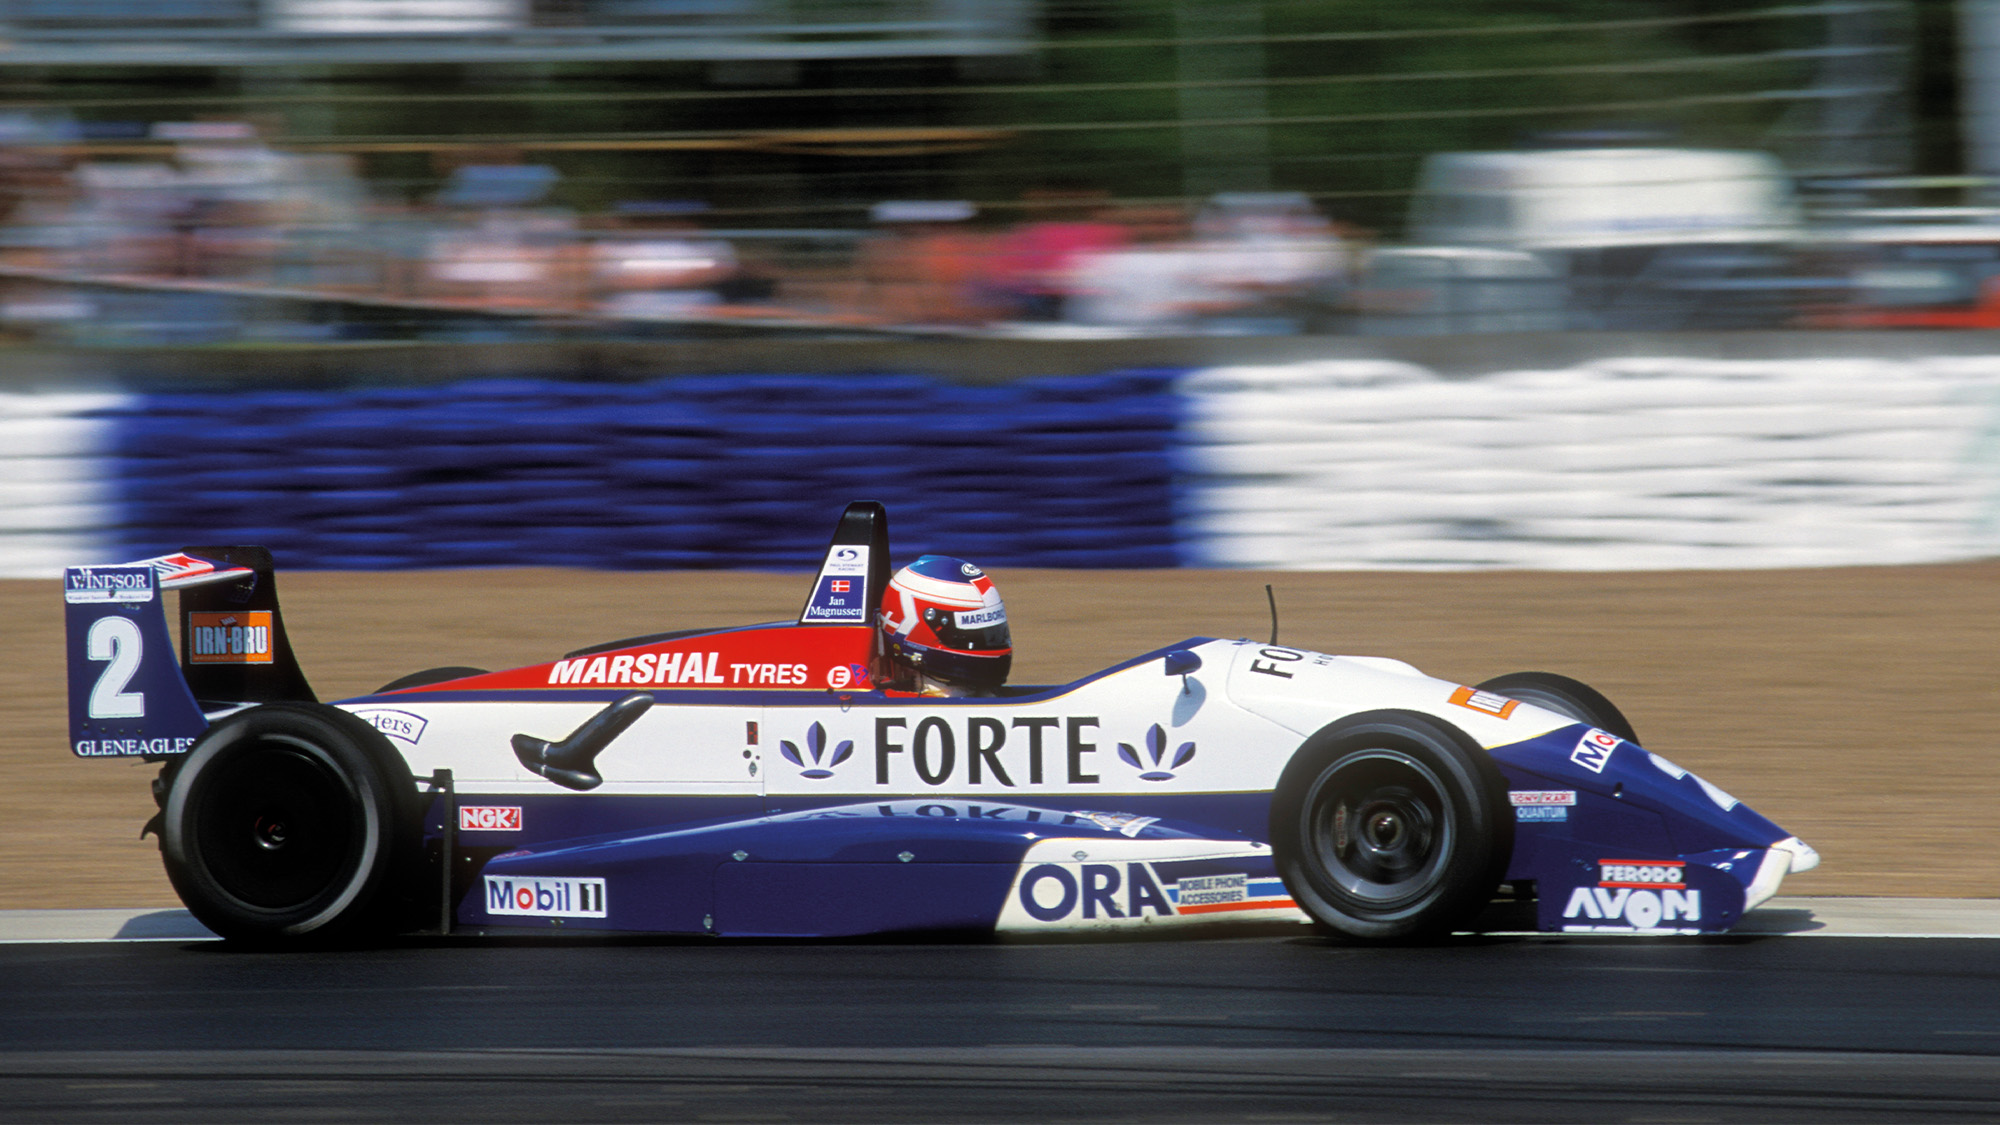 Jan Magnussen driving for Paul Stewart Racing in 1994